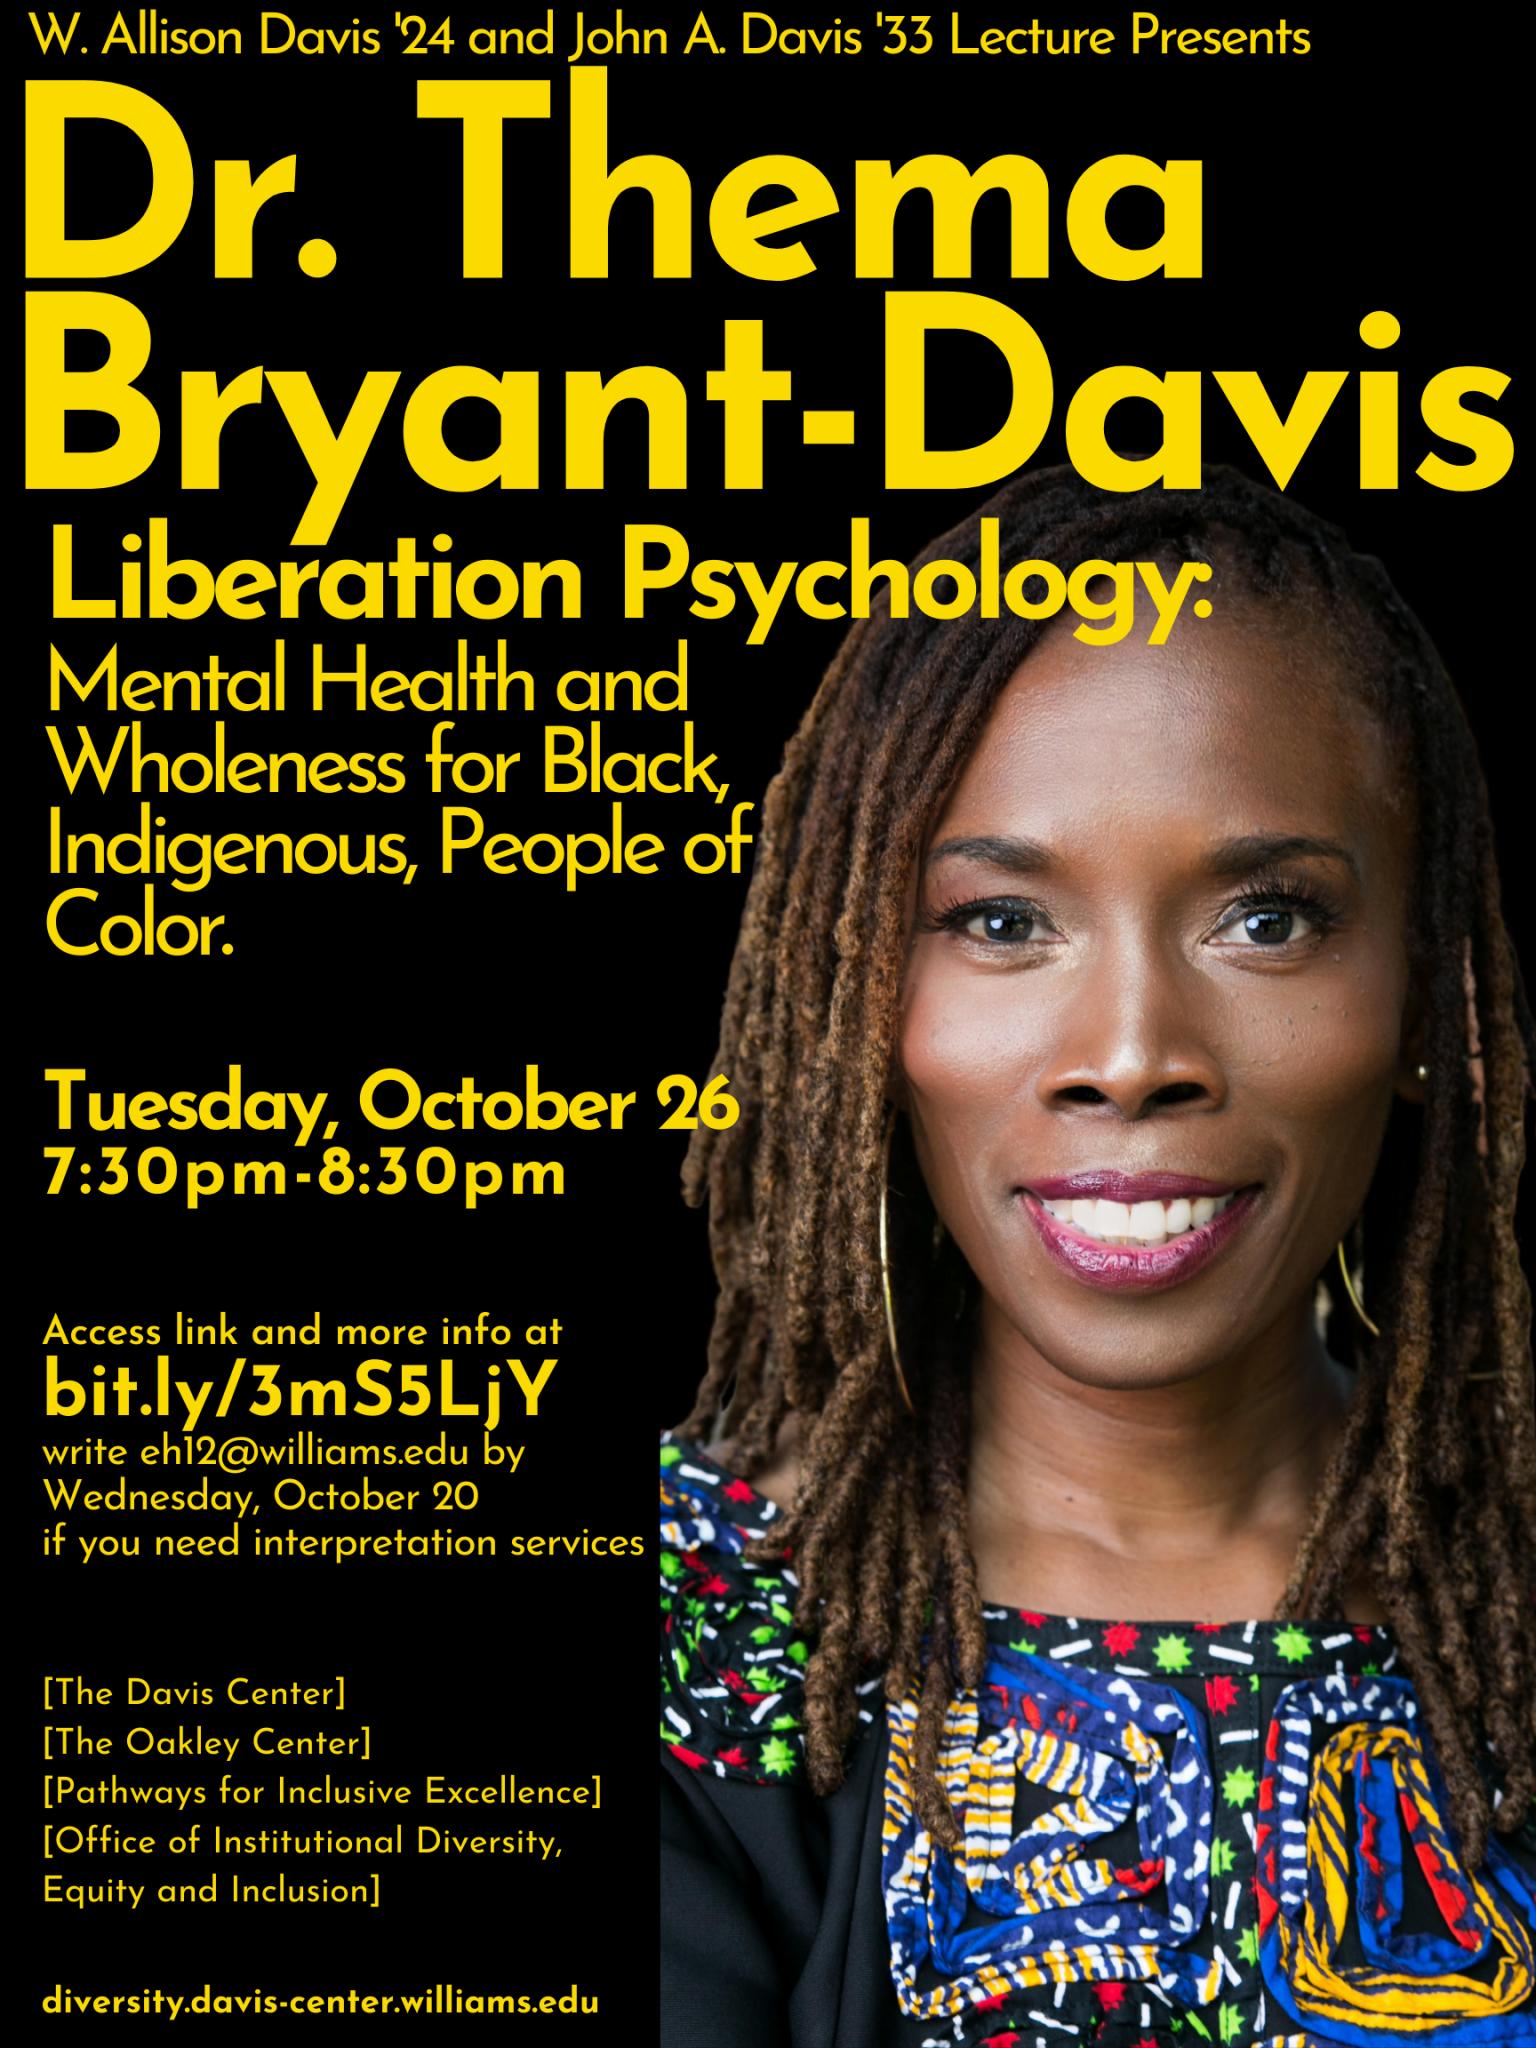 Dr. Thema Bryant Davis